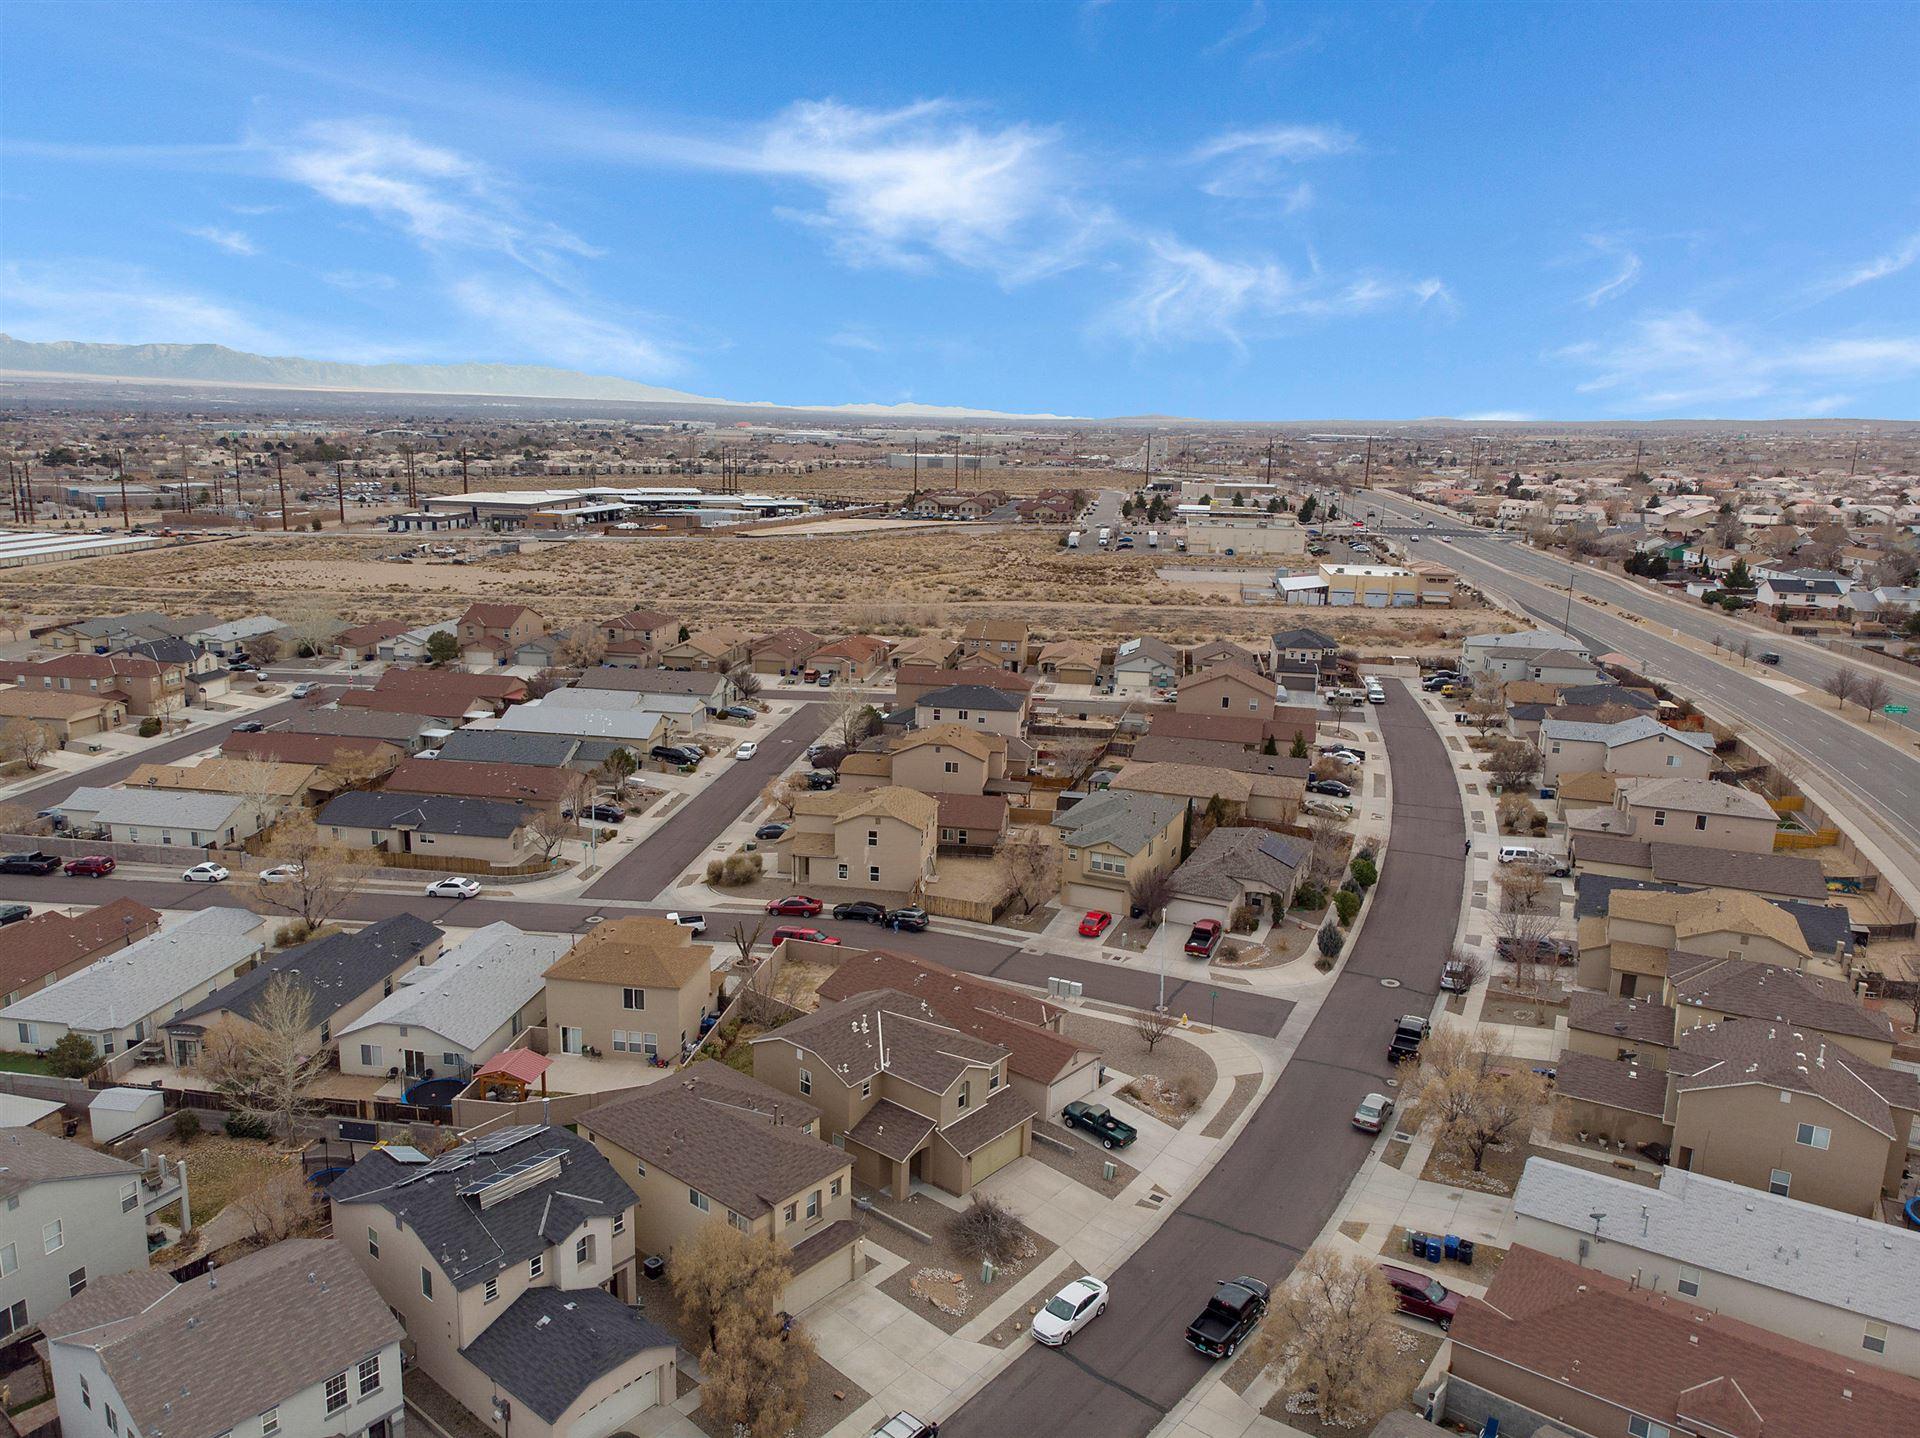 2504 ANGEL Drive NW, Albuquerque, NM 87120 - MLS#: 986285